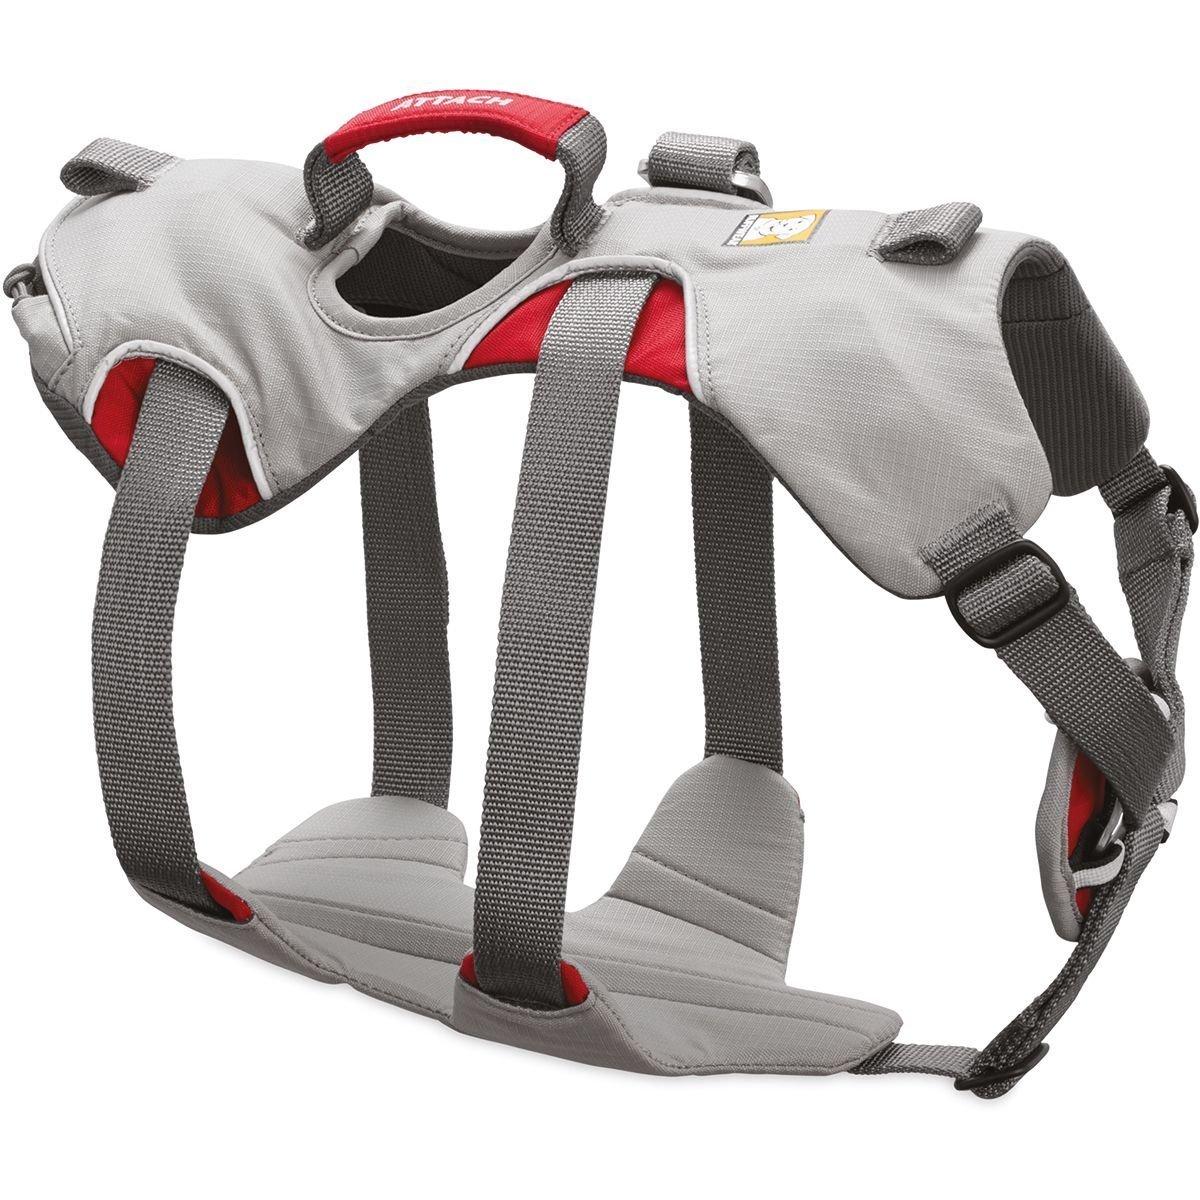 Ruffwear Hundegeschirr Doubleback™ Harness, Bild 3